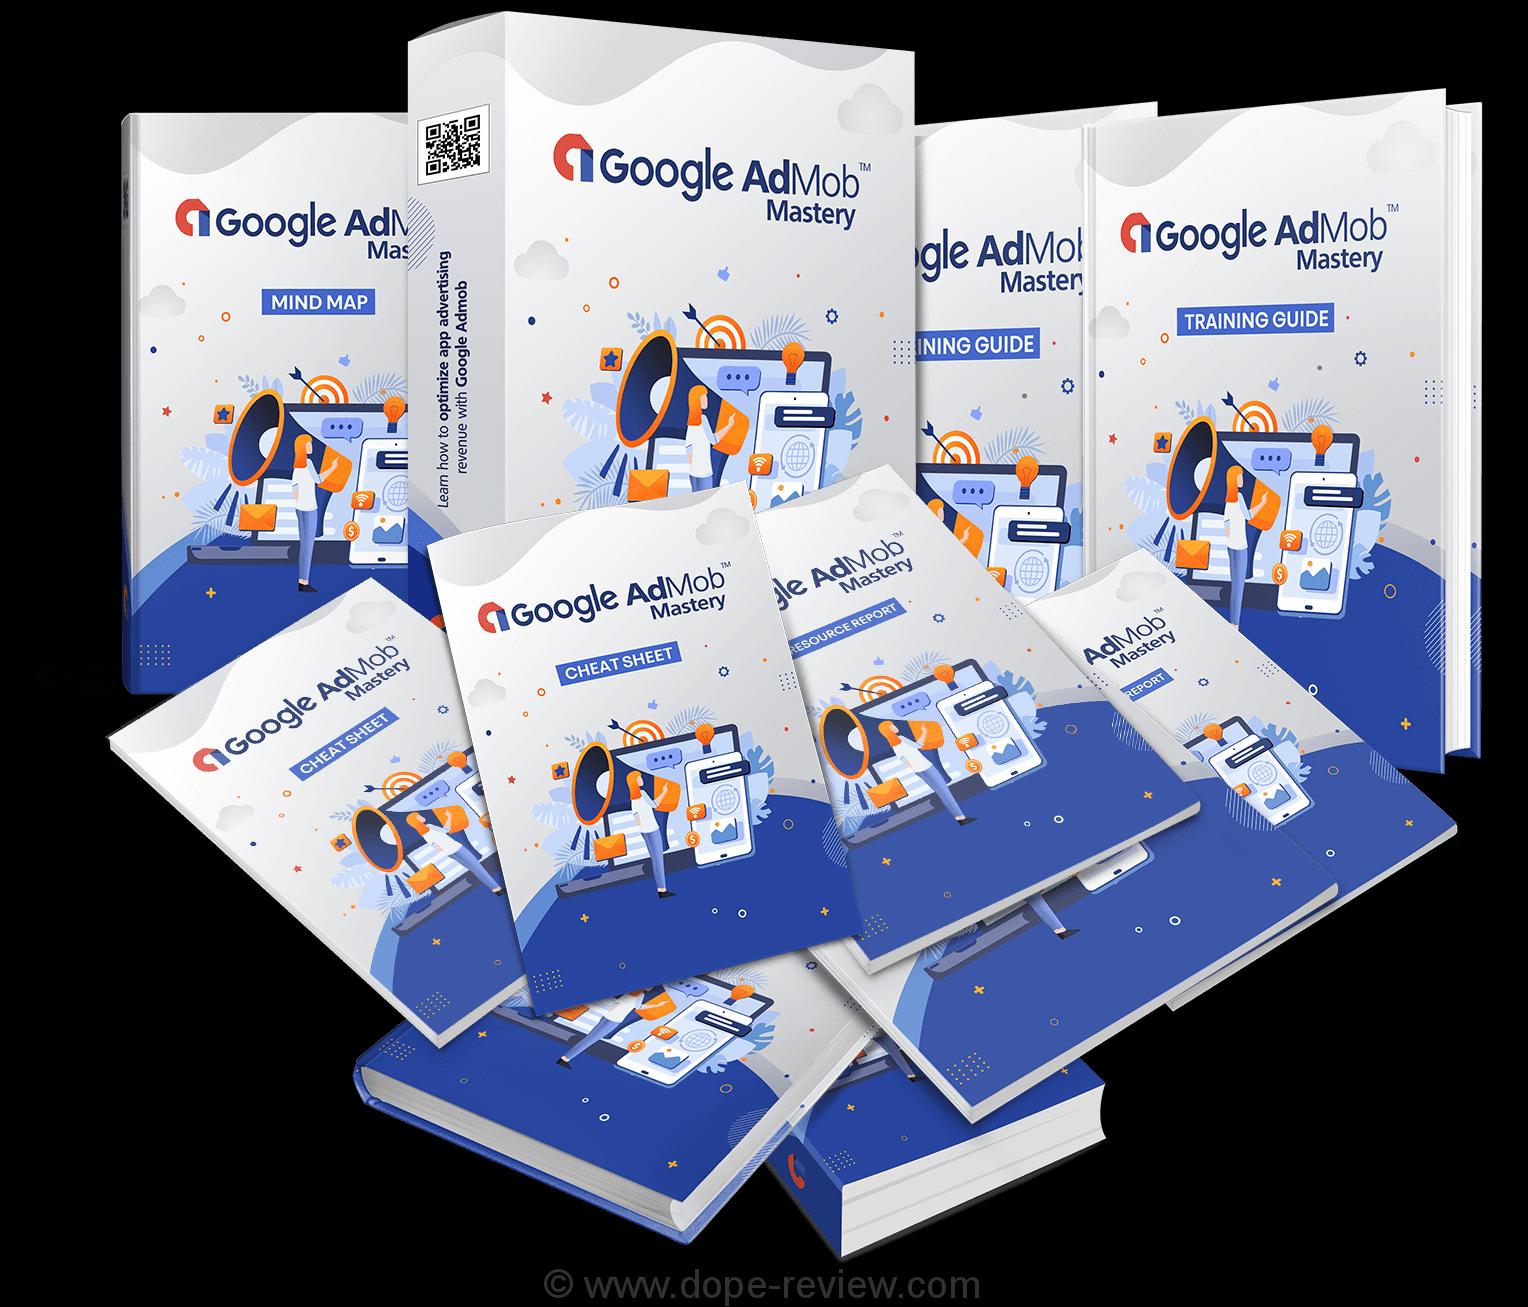 Google AdMob Mastery Review